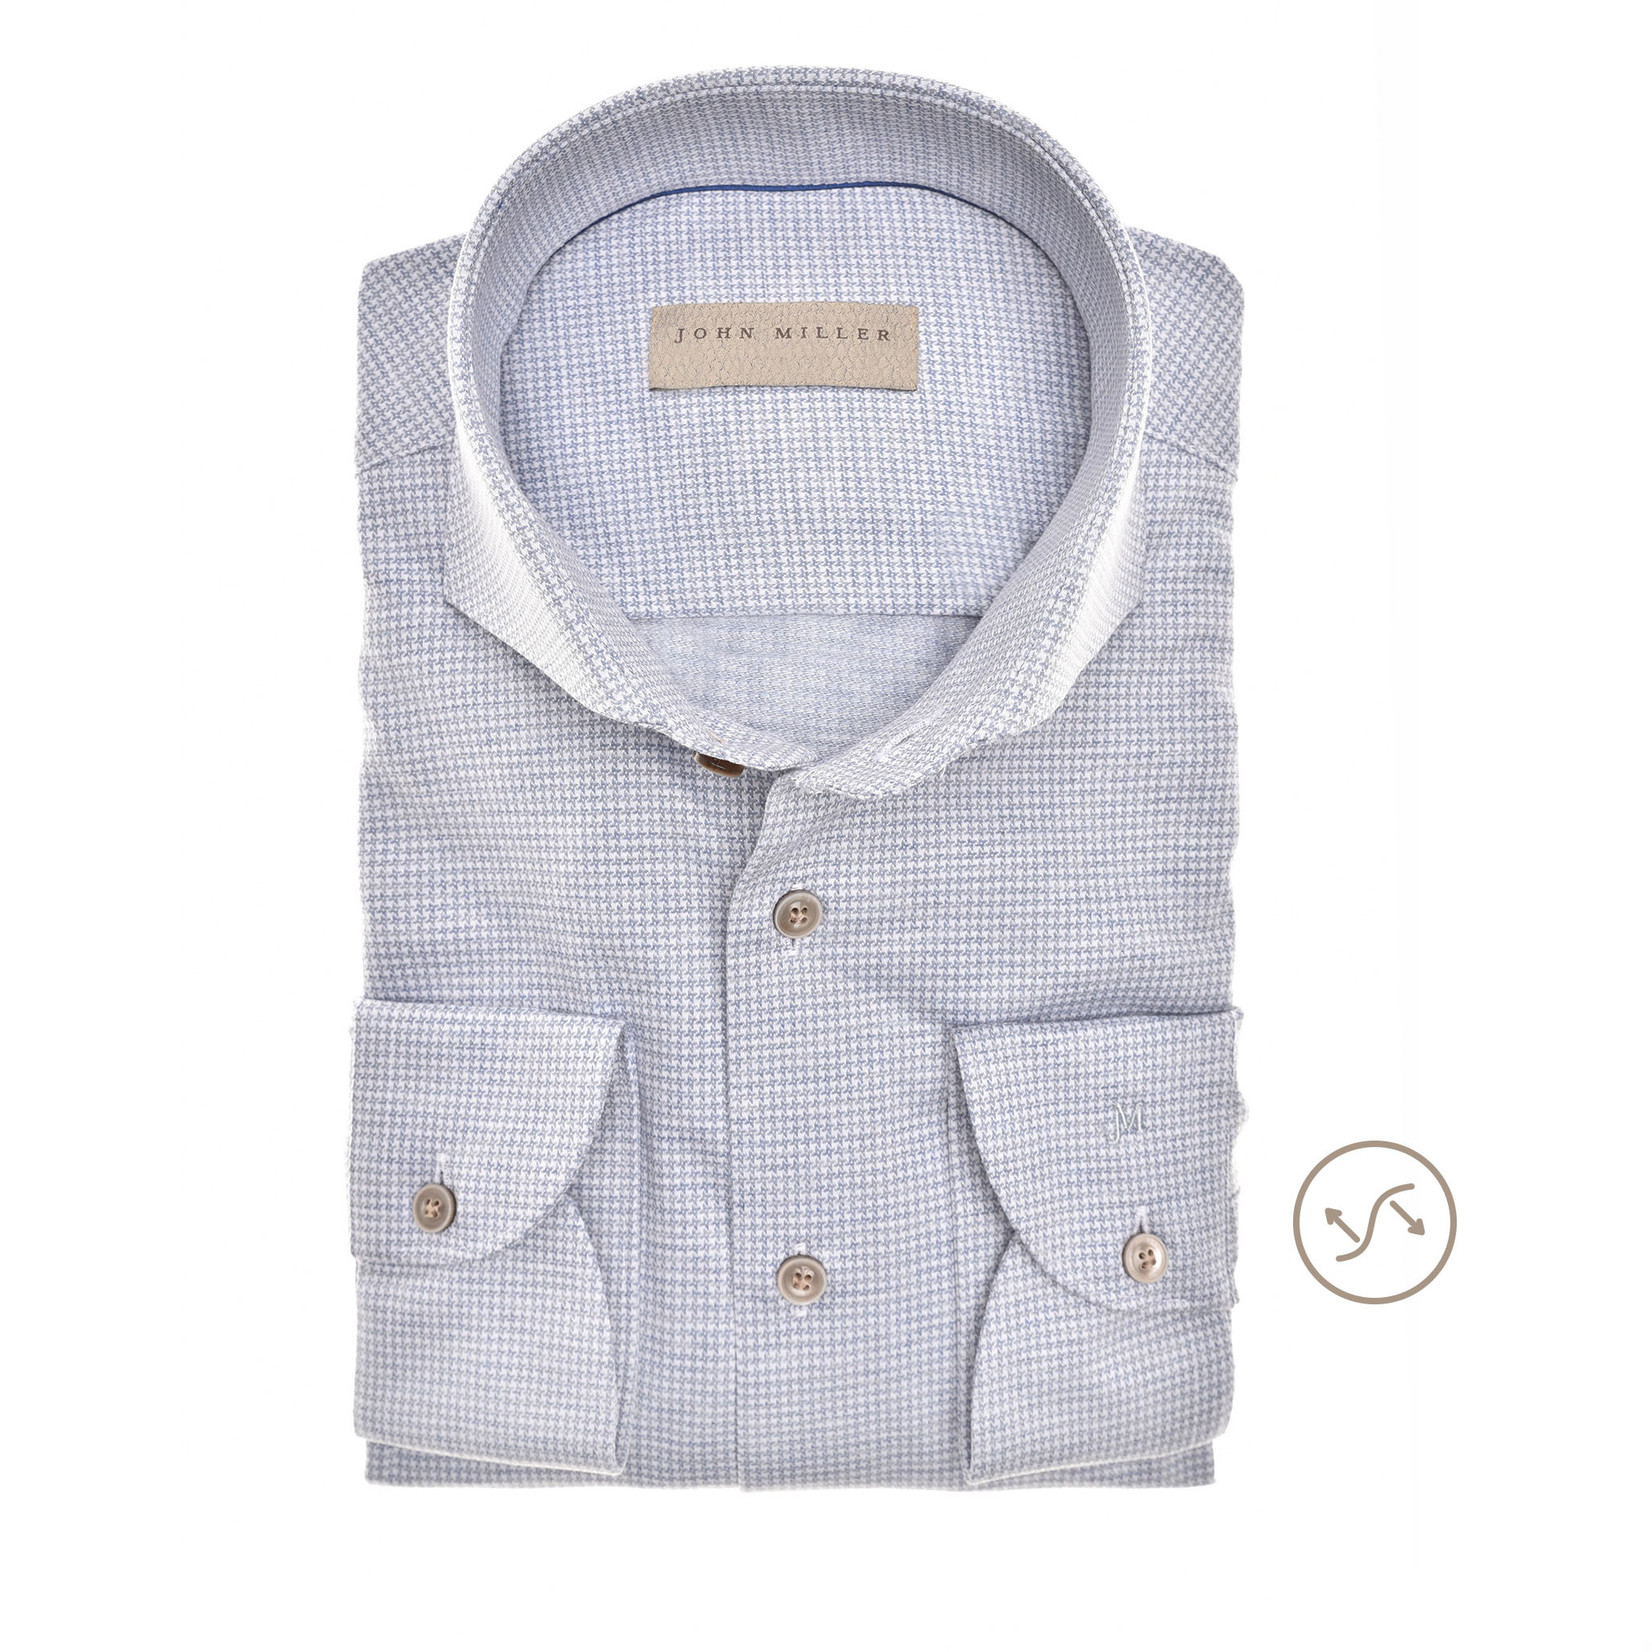 John Miller tailored fit overhemd lichtblauw print